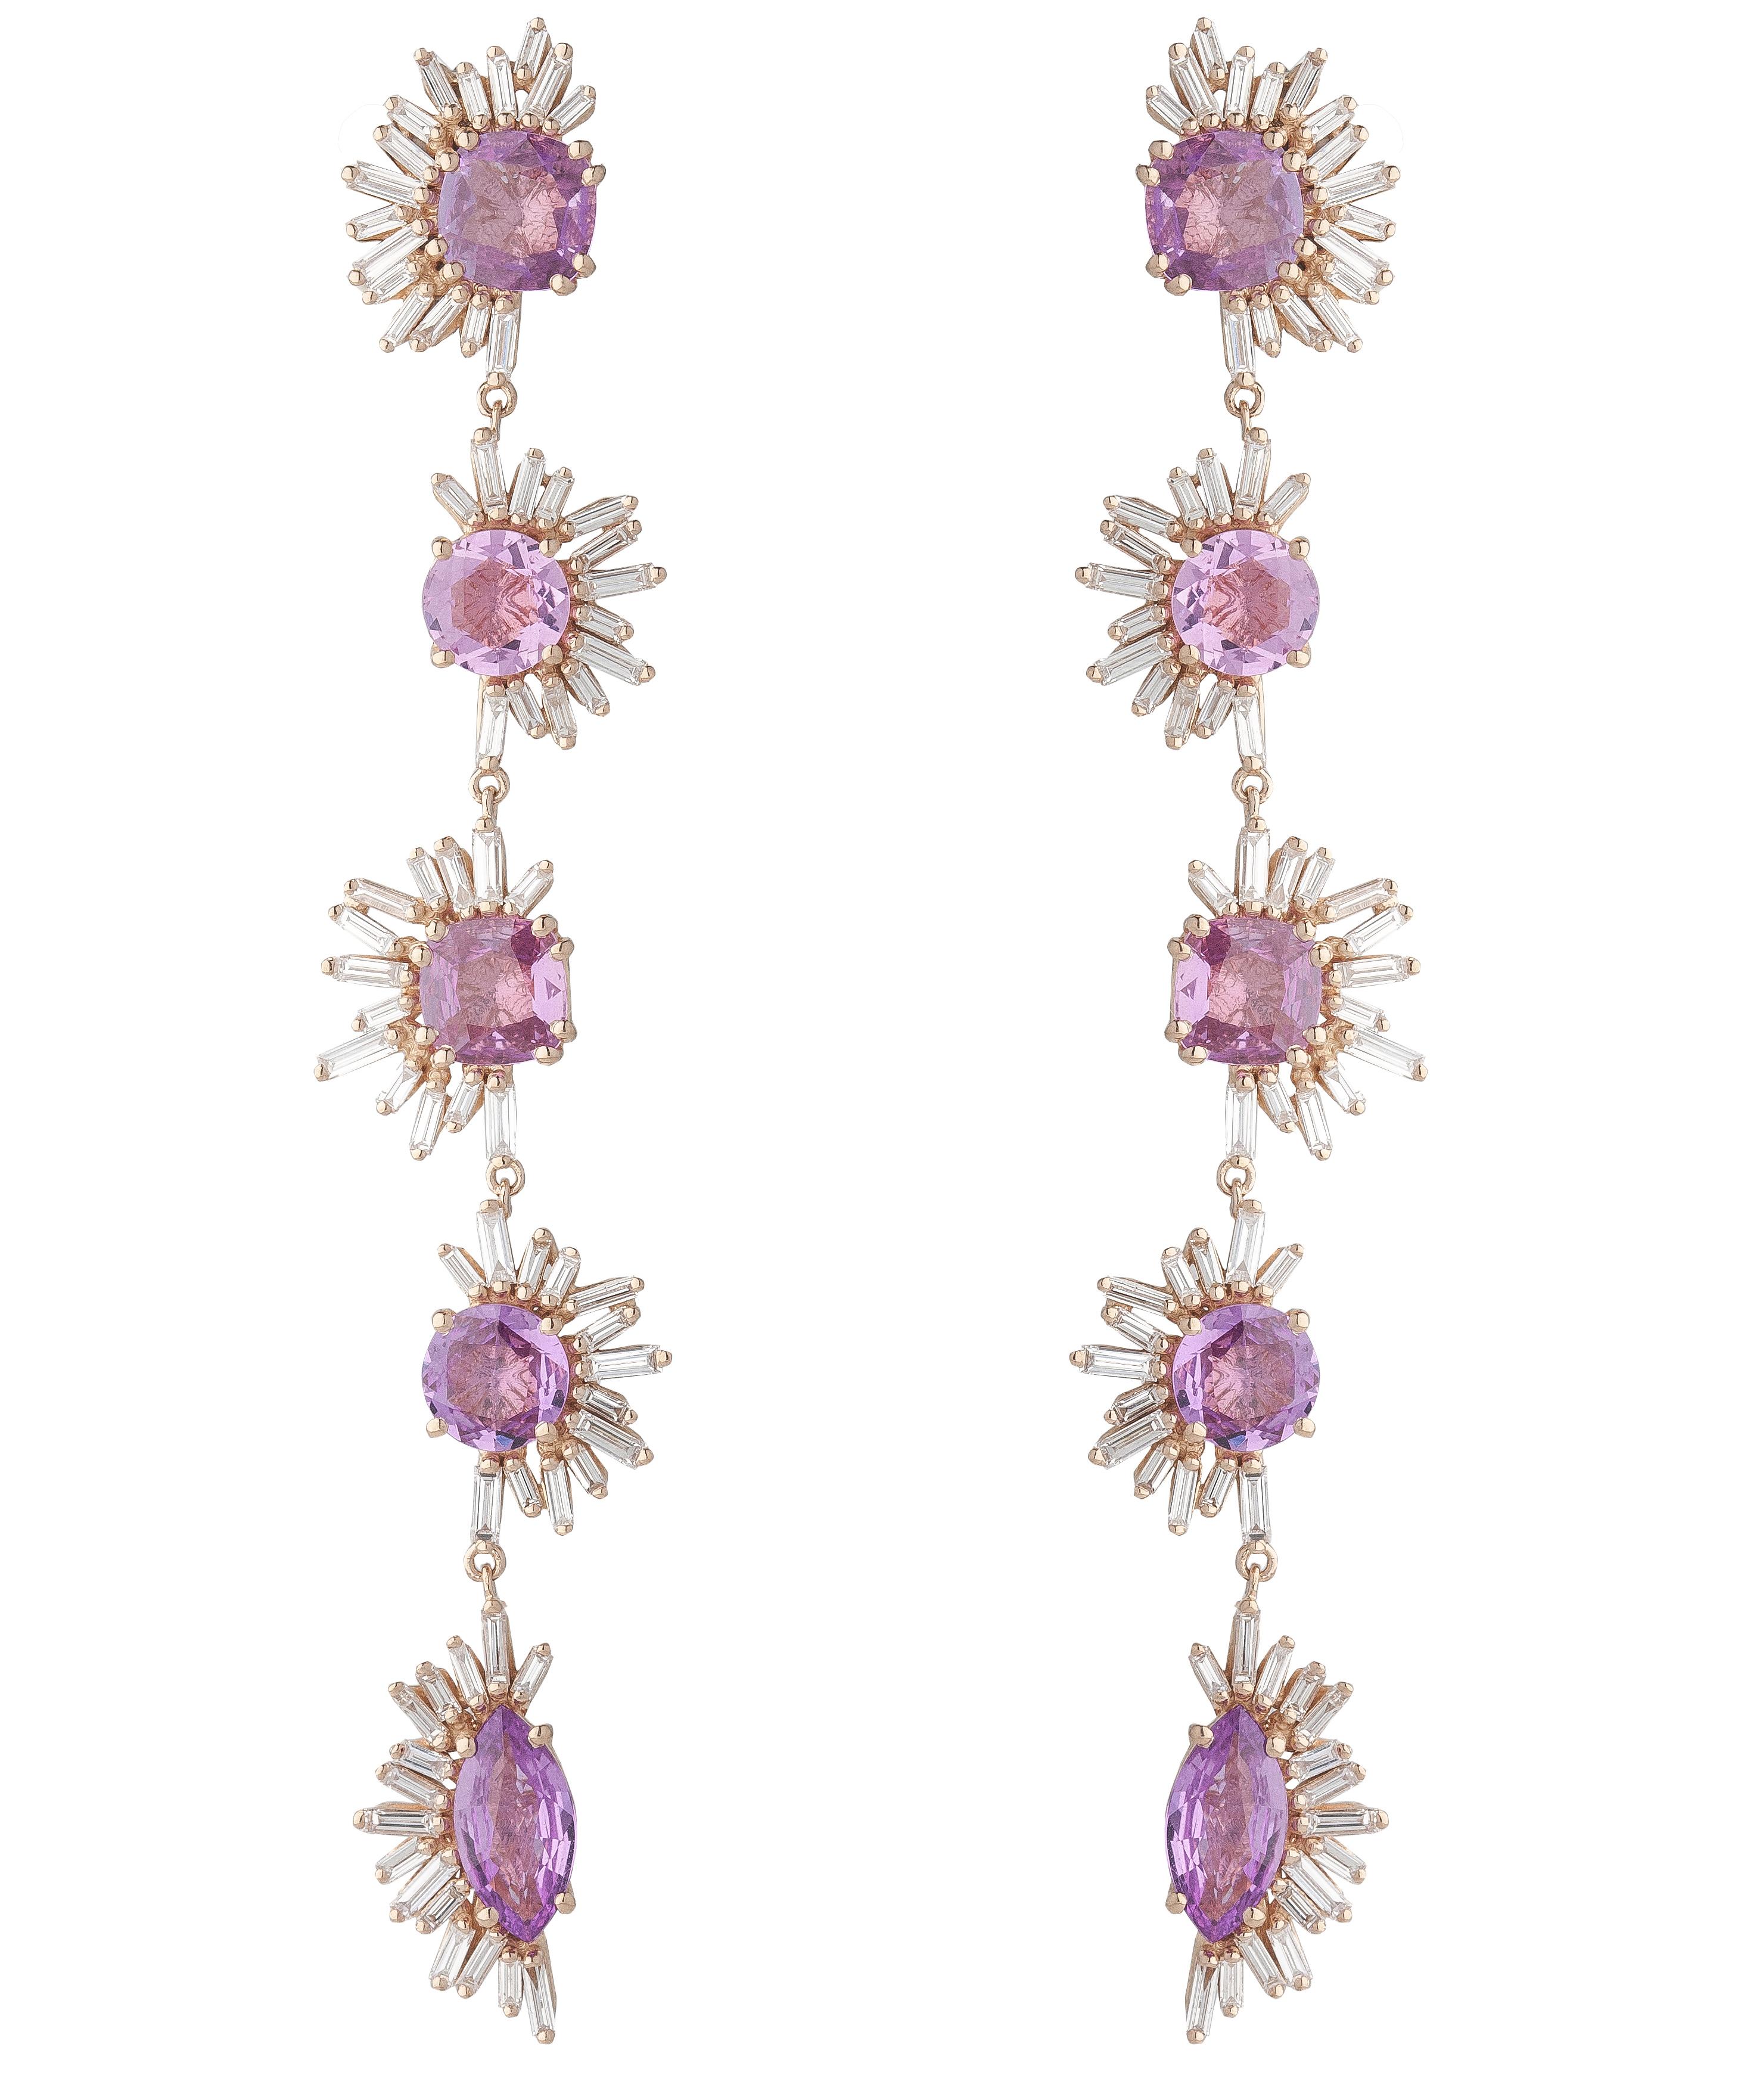 Suzanna Kalan Fireworks pink sapphire earrings | JCK On Your Market